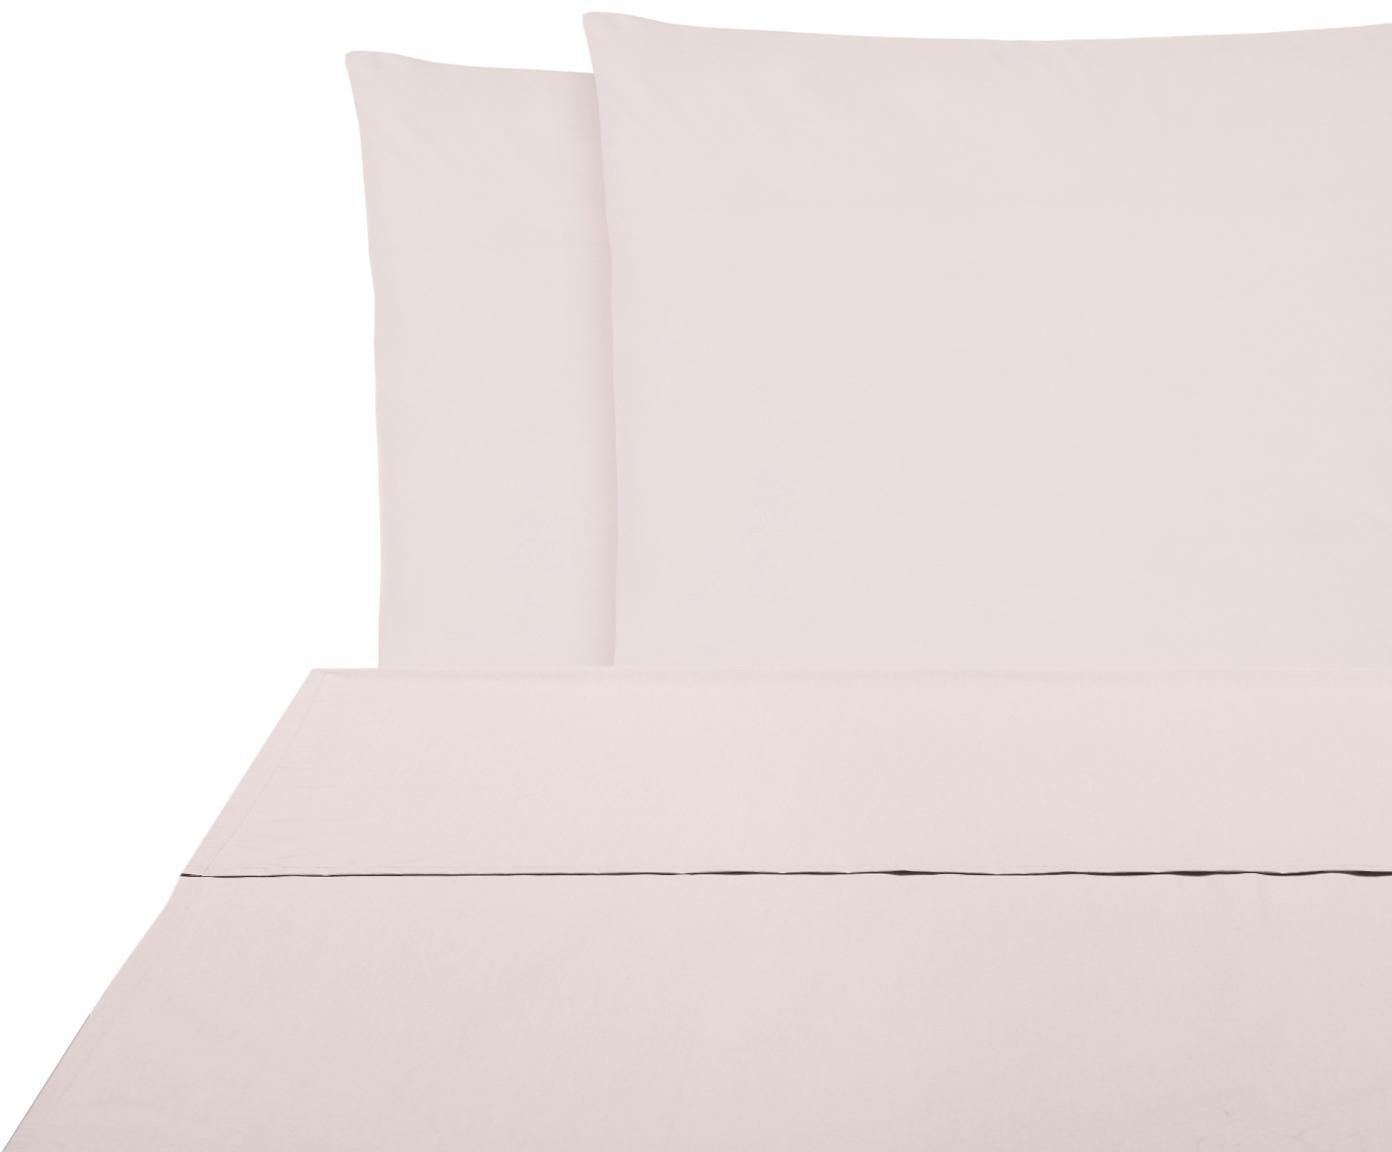 Set lenzuola in percalle Elsie 2 pz, Tessuto: percalle Densità del filo, Rosa, 240 x 300 cm